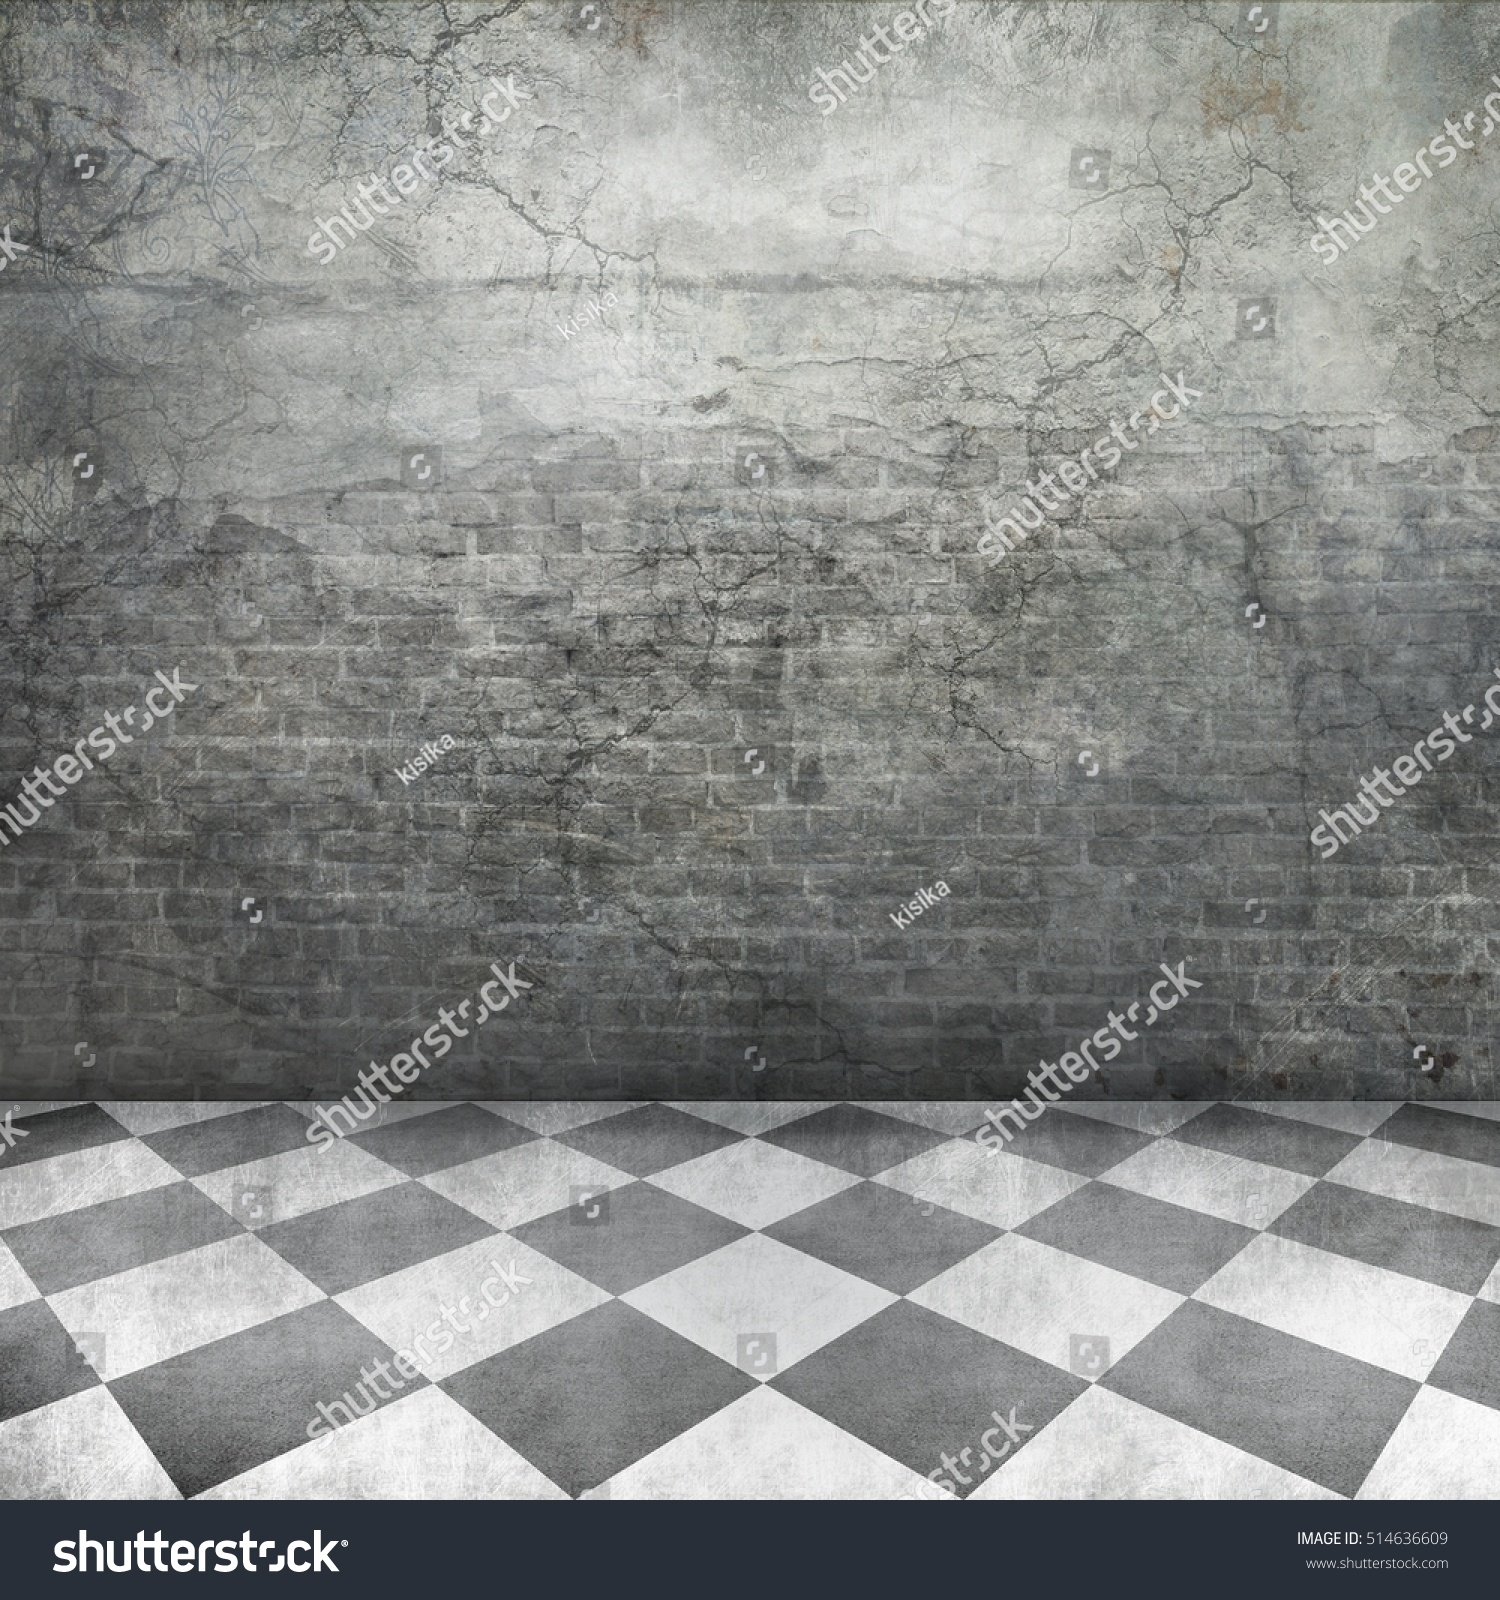 old castle interior background grunge brick stock photo 514636609